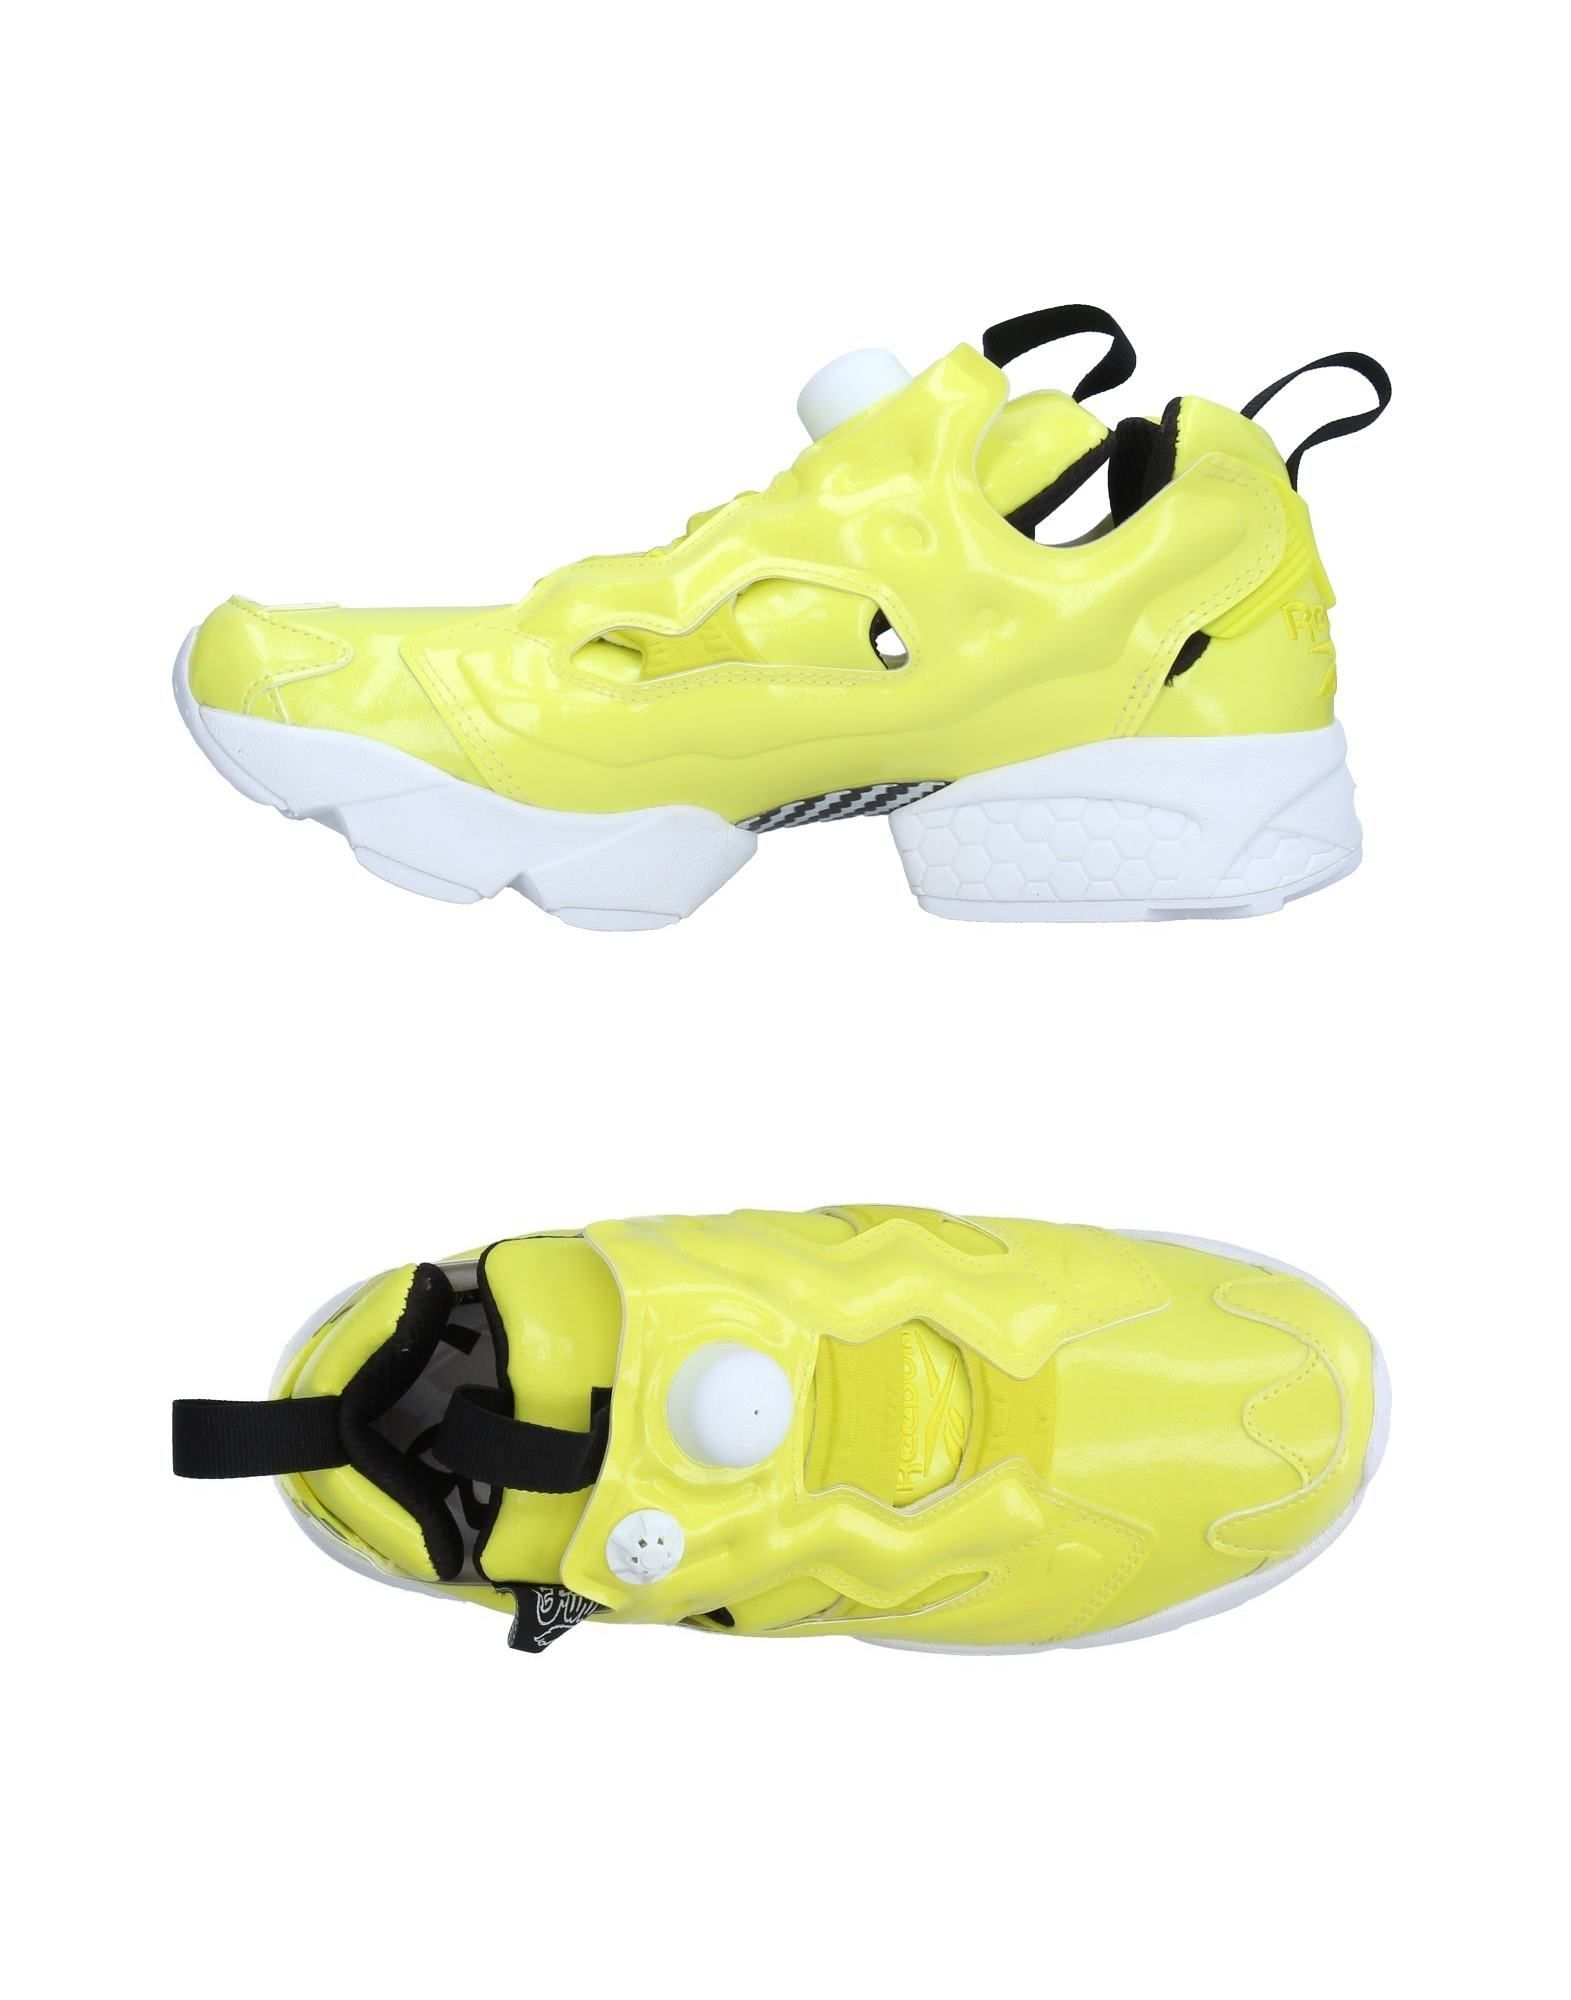 Reebok Sneakers Damen  11263916FU Gute Qualität beliebte Schuhe